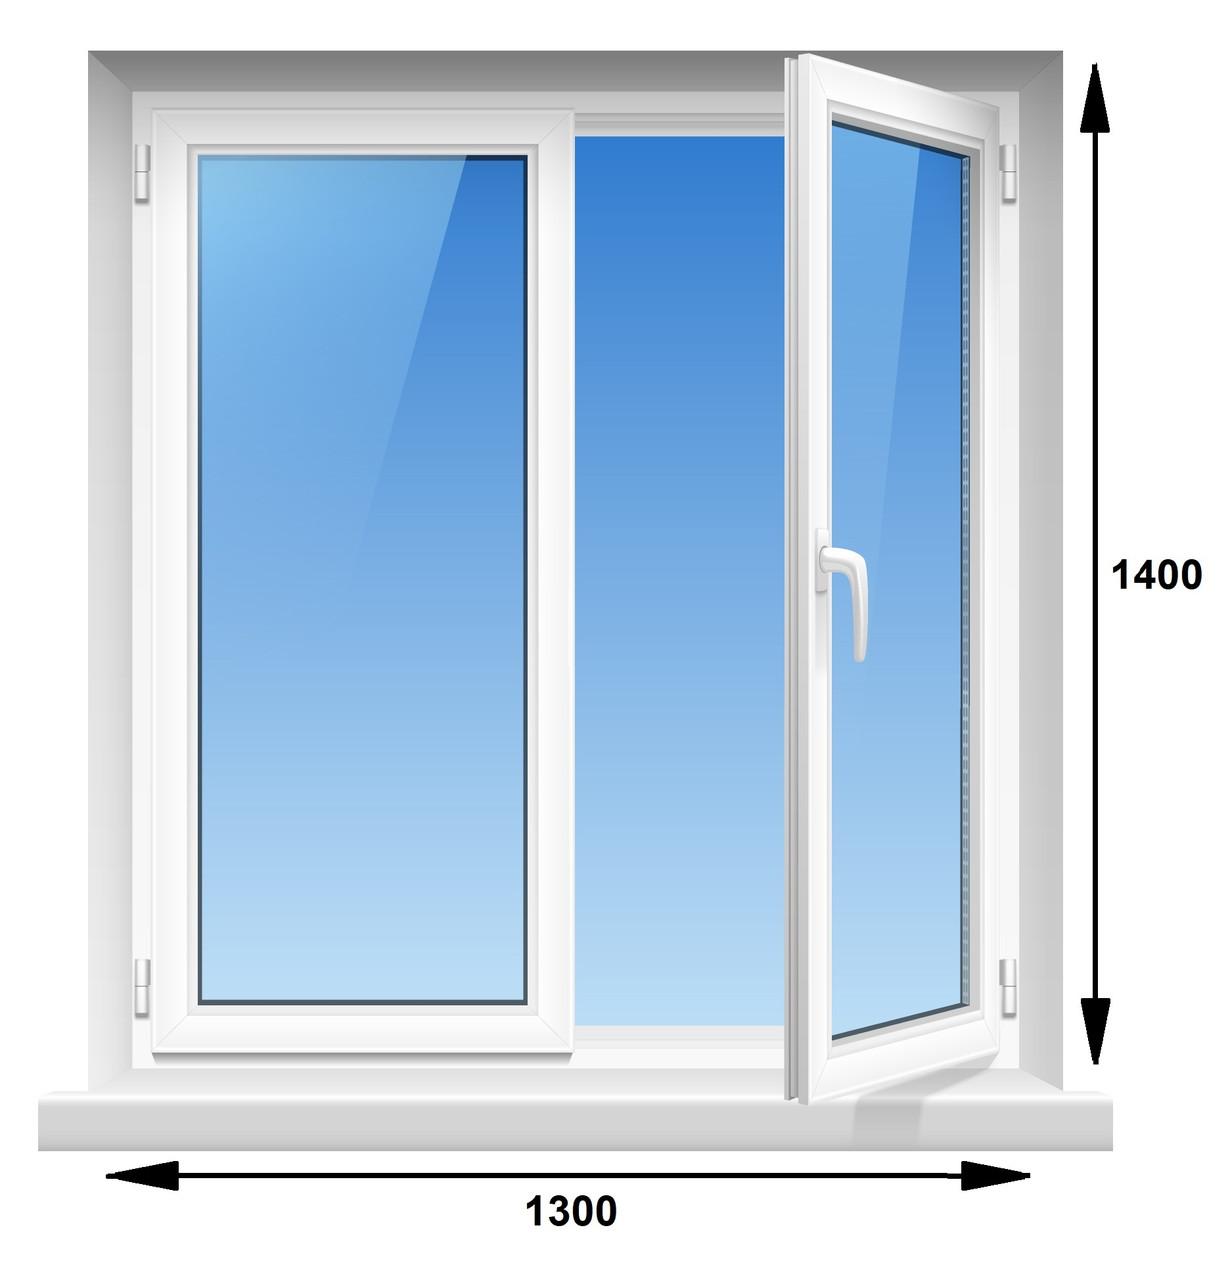 Пластиковое окно, Kommerling 70GT plus 70 мм, 5-этажка Хрущевка 1300х1400 мм энергосберегающий стеклопакет